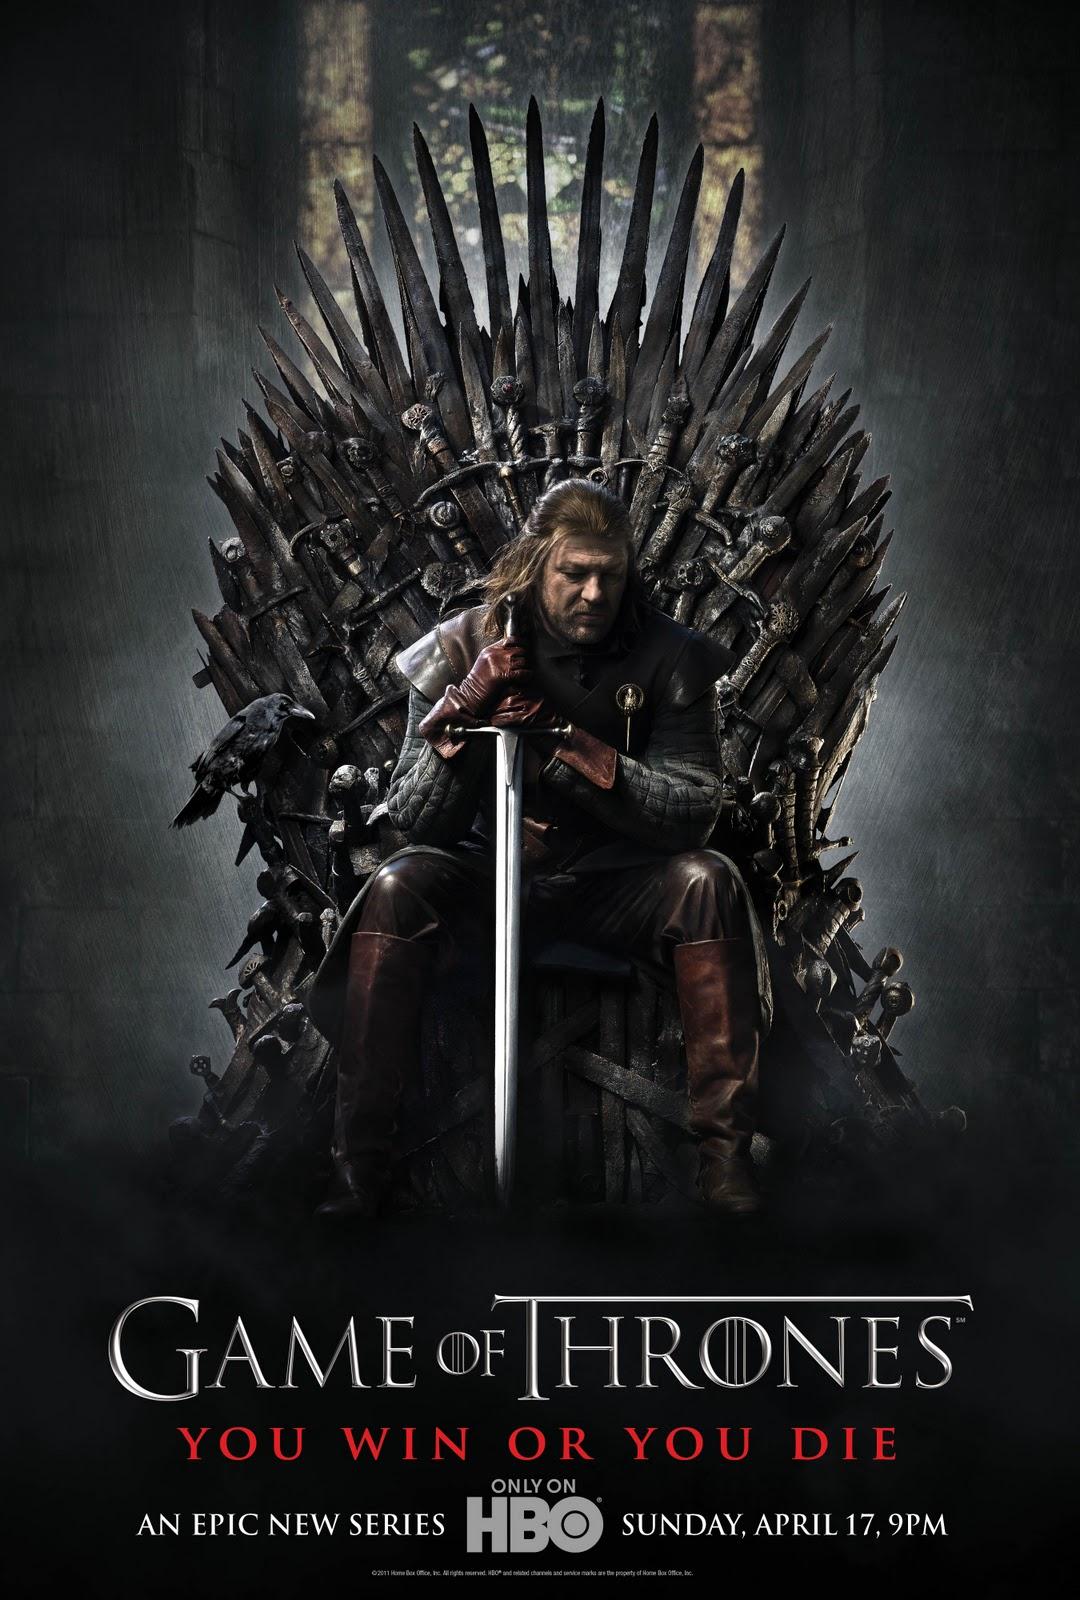 http://3.bp.blogspot.com/-XUxwijbnrPM/TuUmh9X3KSI/AAAAAAAABRE/B4TGTliwGcs/s1600/game-of-thrones-poster.jpg